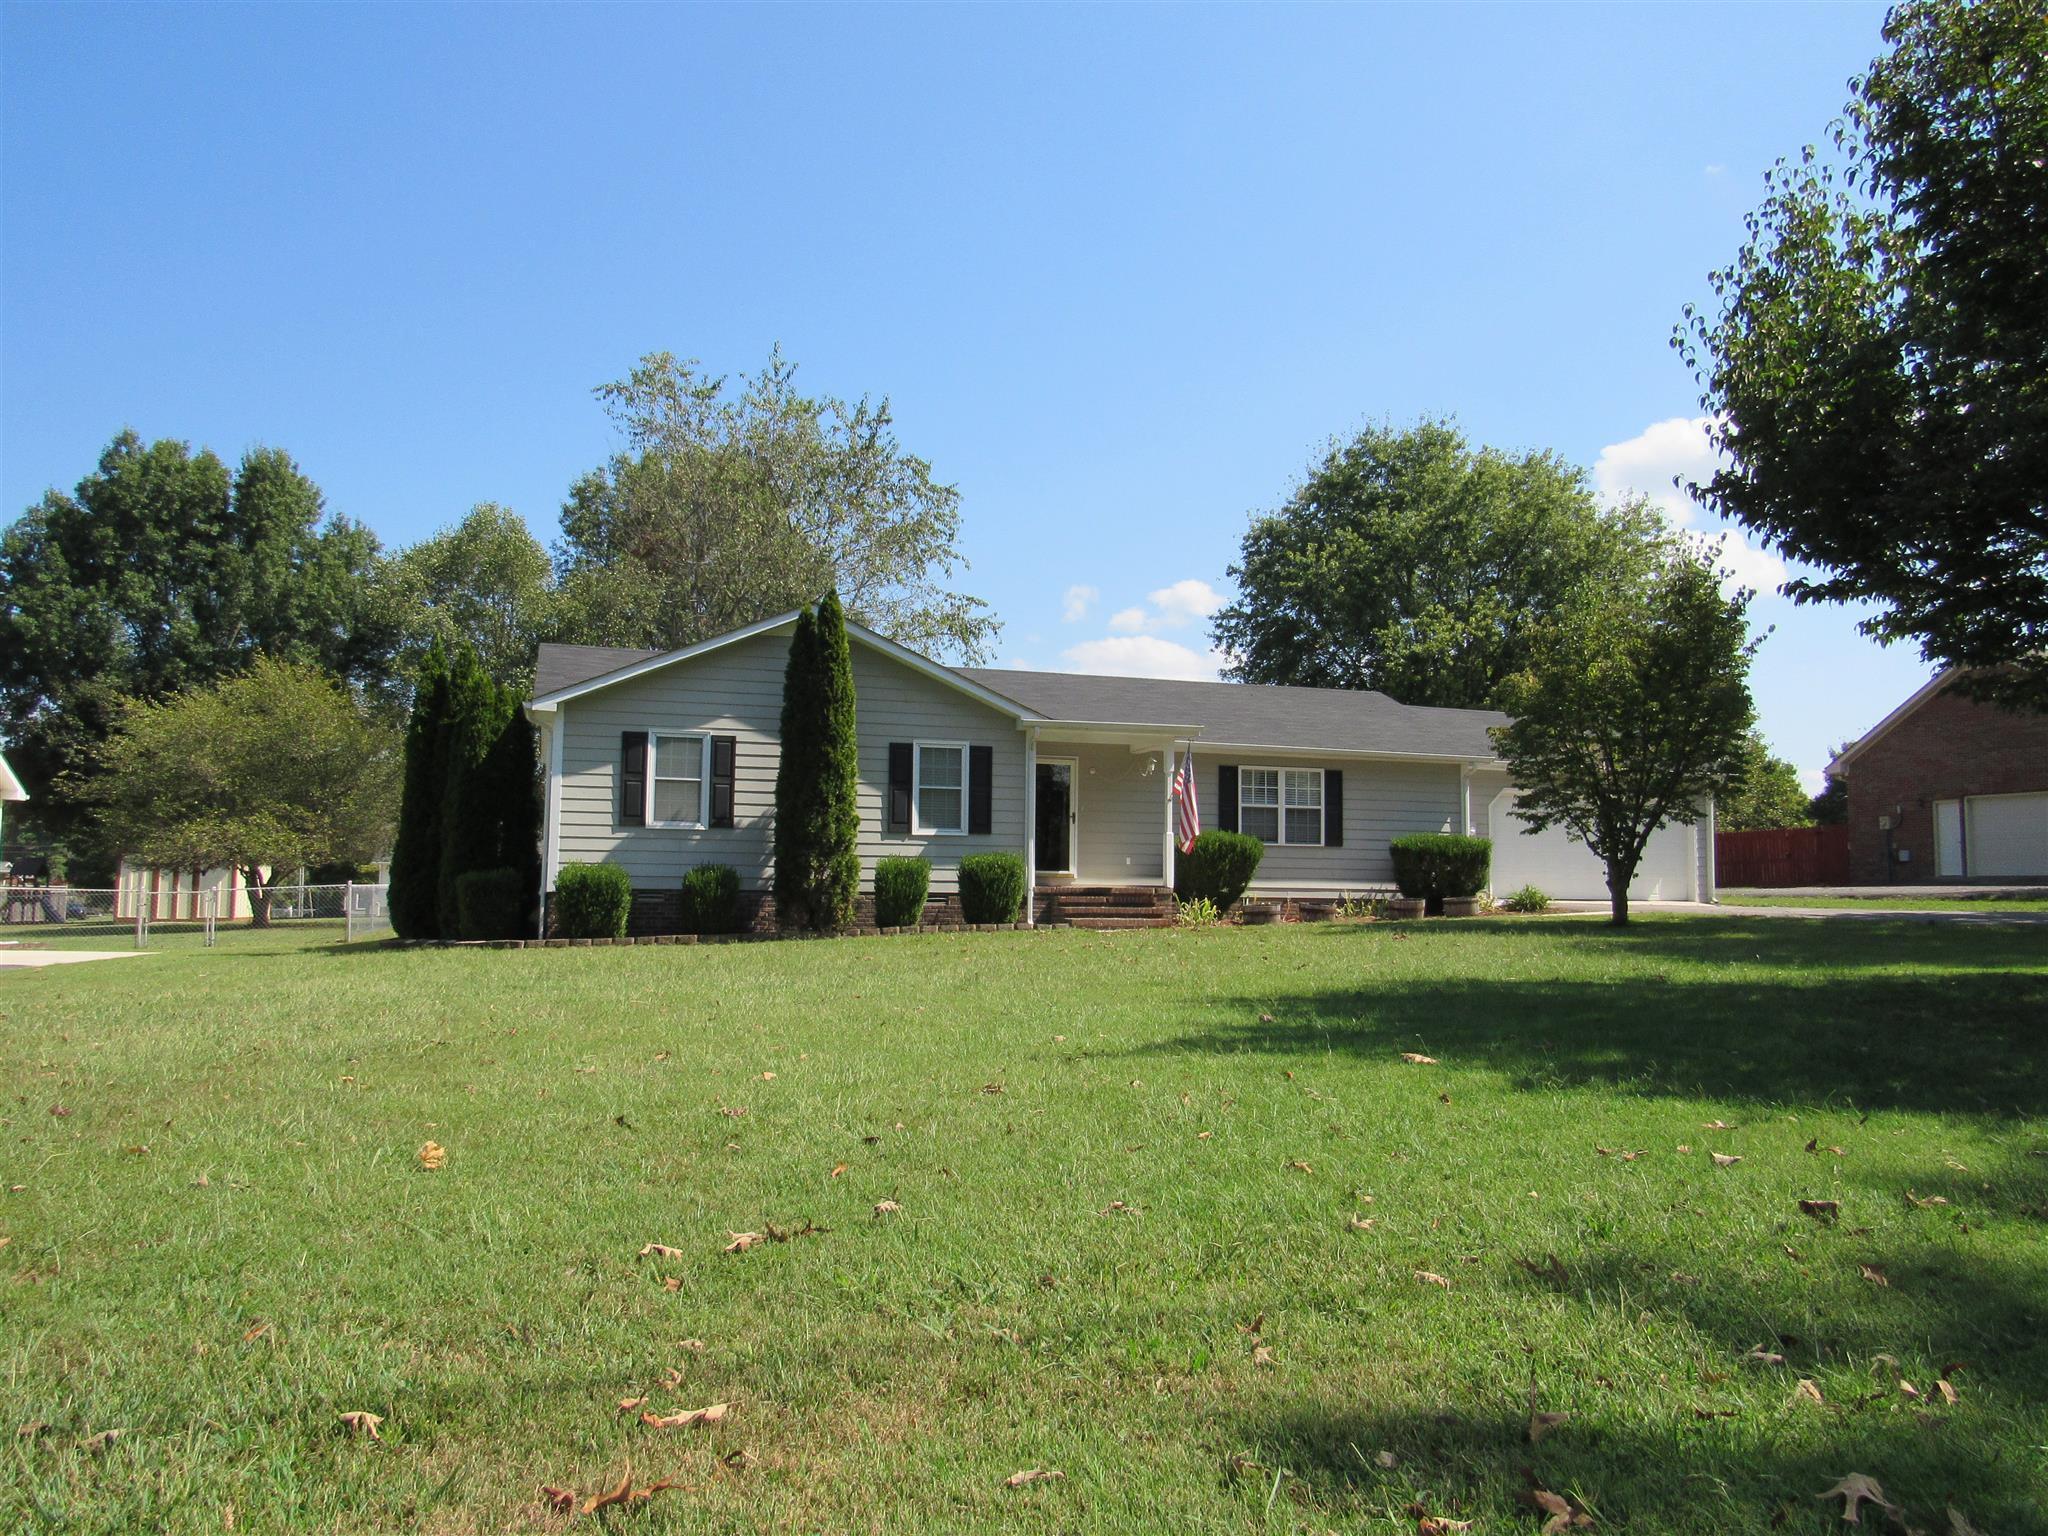 1070 Riley Creek Rd, Tullahoma, TN 37388 - Tullahoma, TN real estate listing